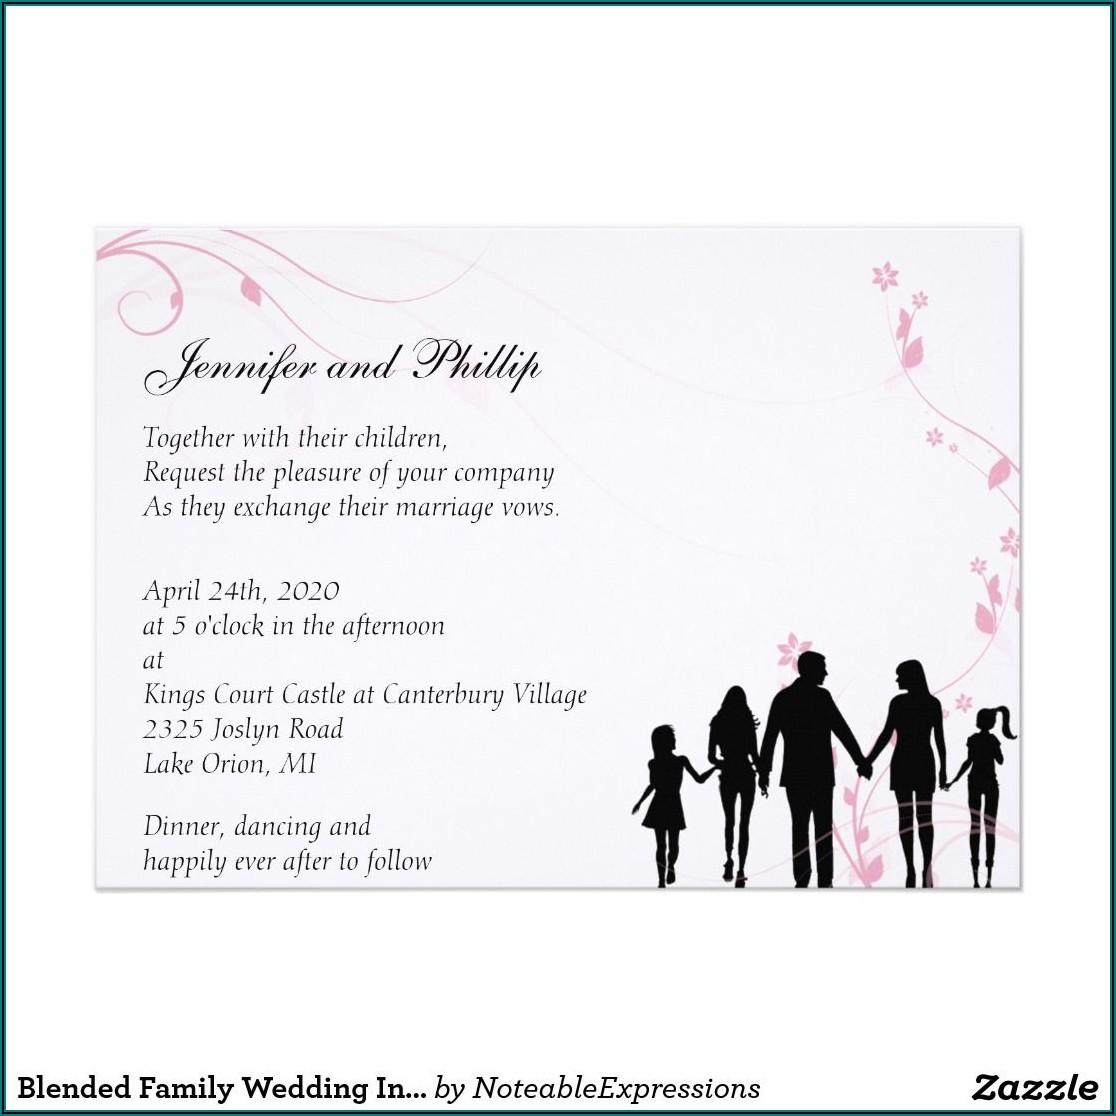 Zazzle Wedding Invitations Samples